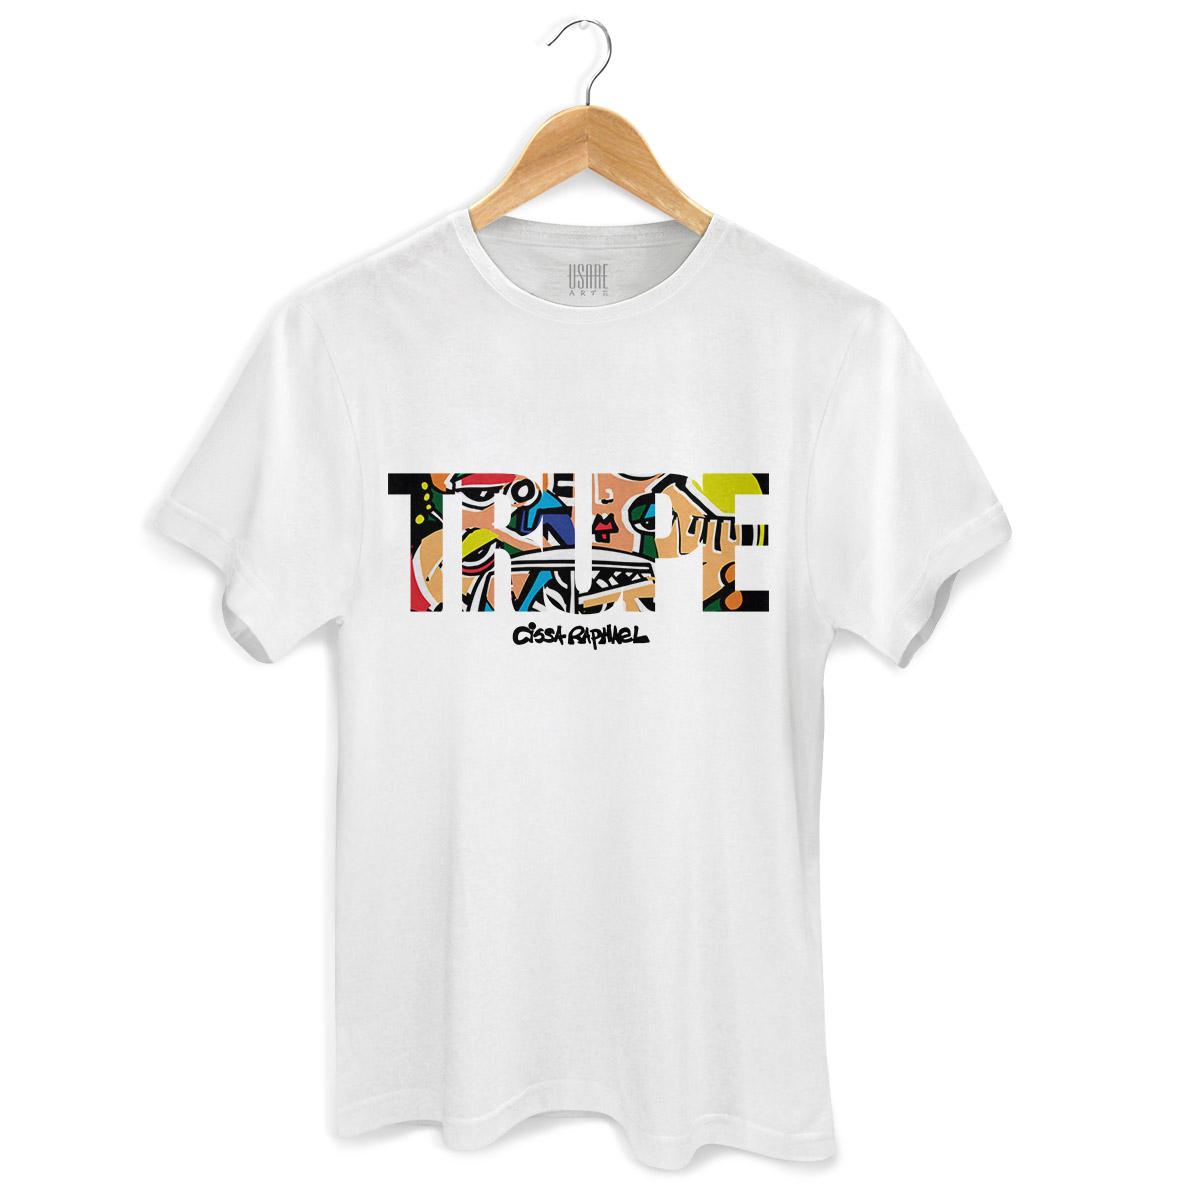 Camiseta Masculina Cissa Raphael Trupe Type